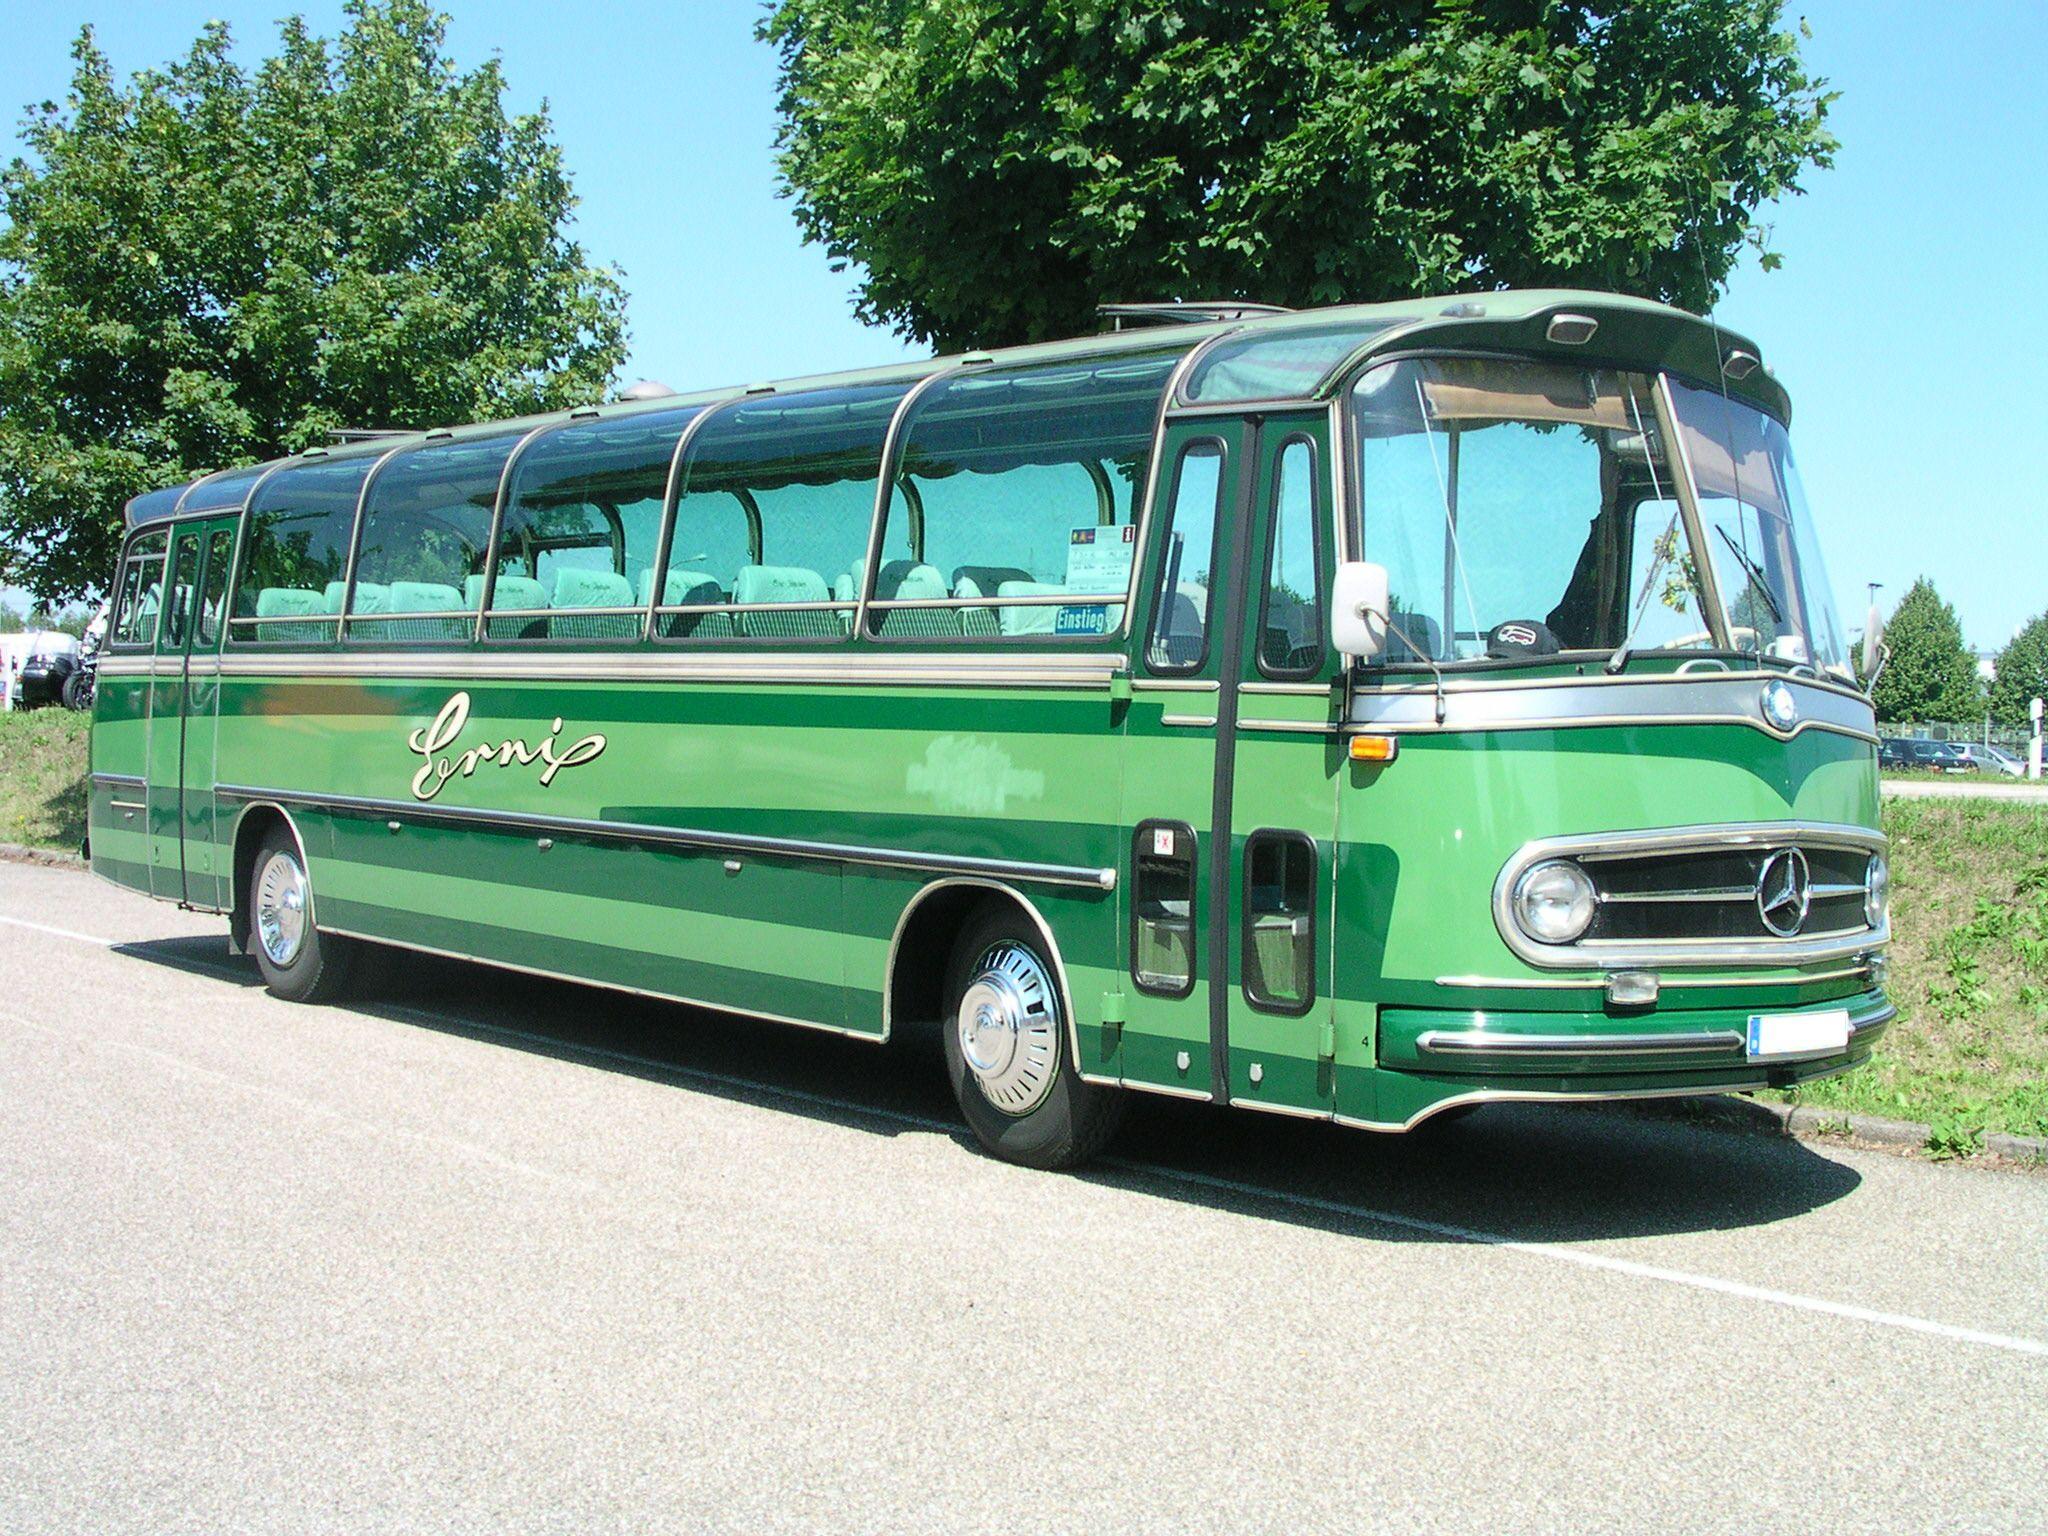 O 321 mercedes google da ara bus coachclassic carsbussetravel gadgetsmotorhomemercedes benzcamperscoachesvehicles